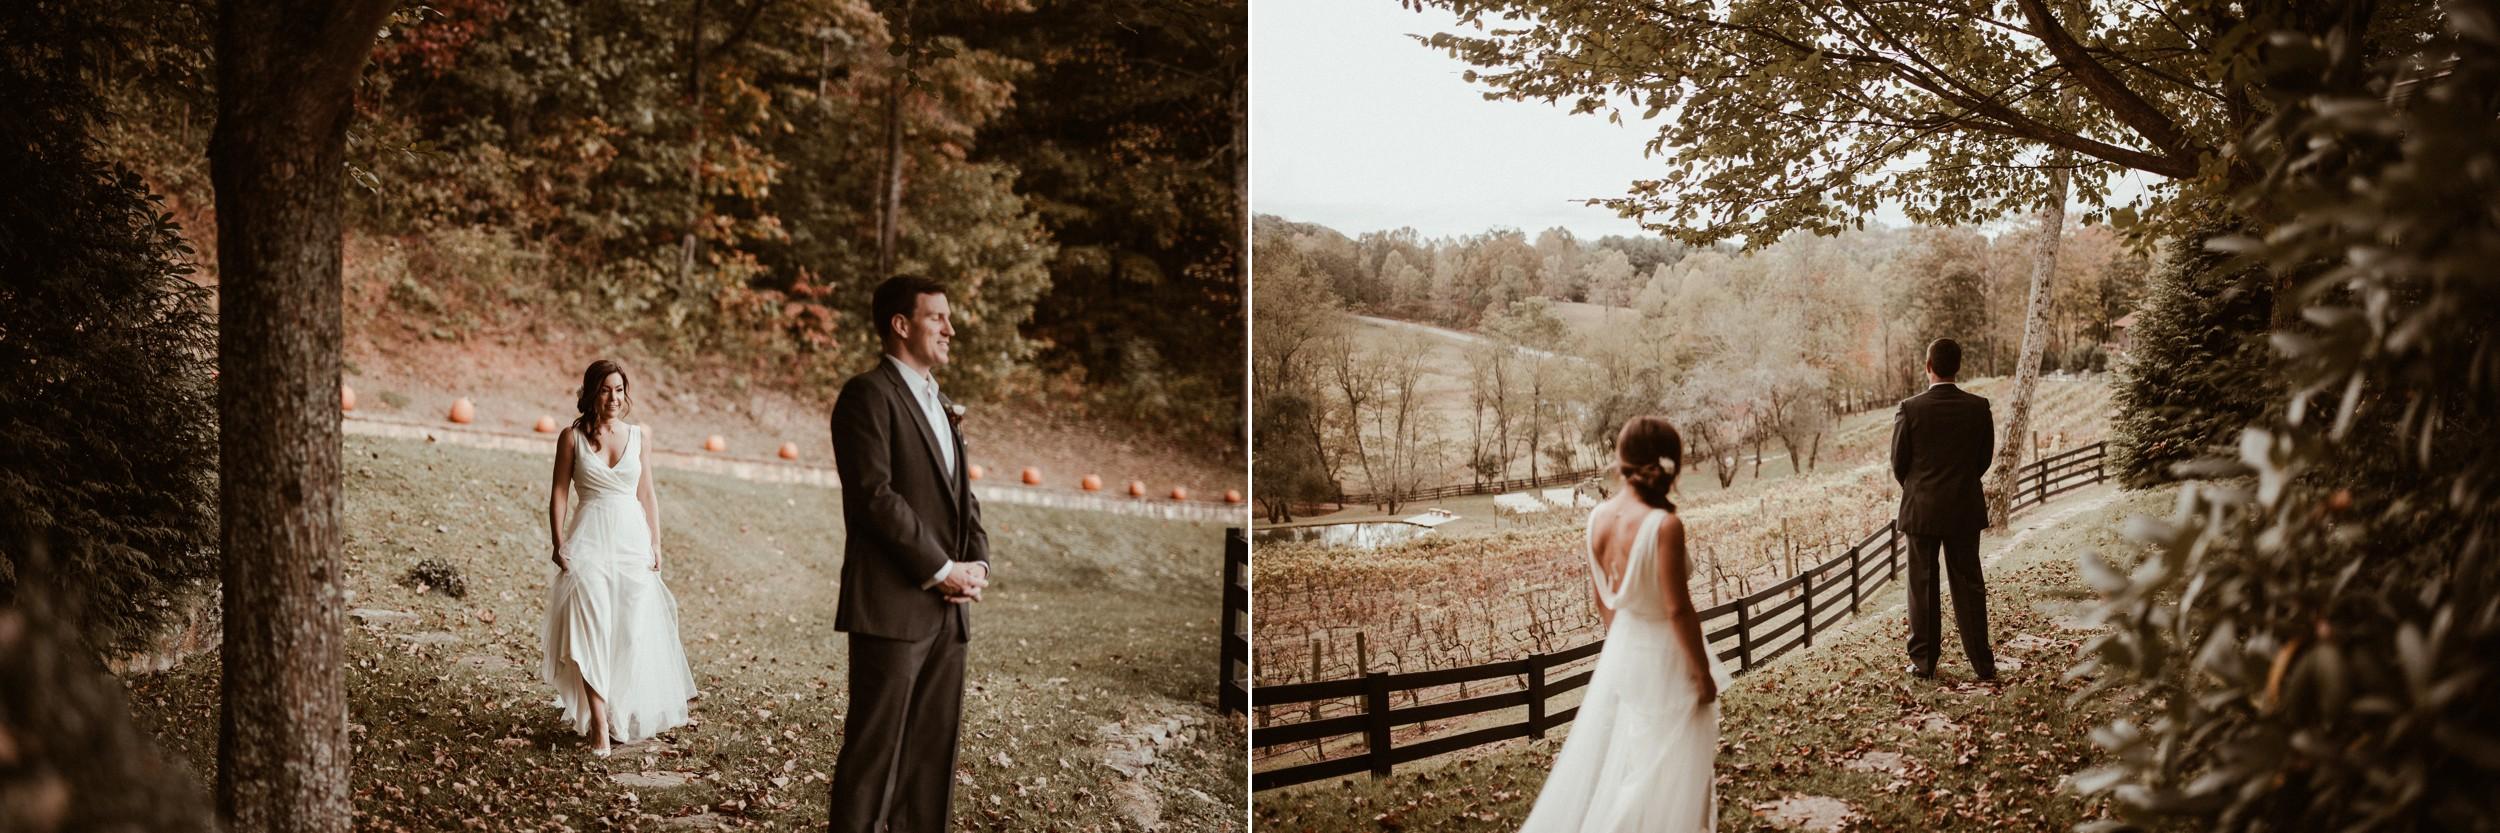 north-carolina-fall-vineyard-wedding-vanessaalvesphotography-33.jpg